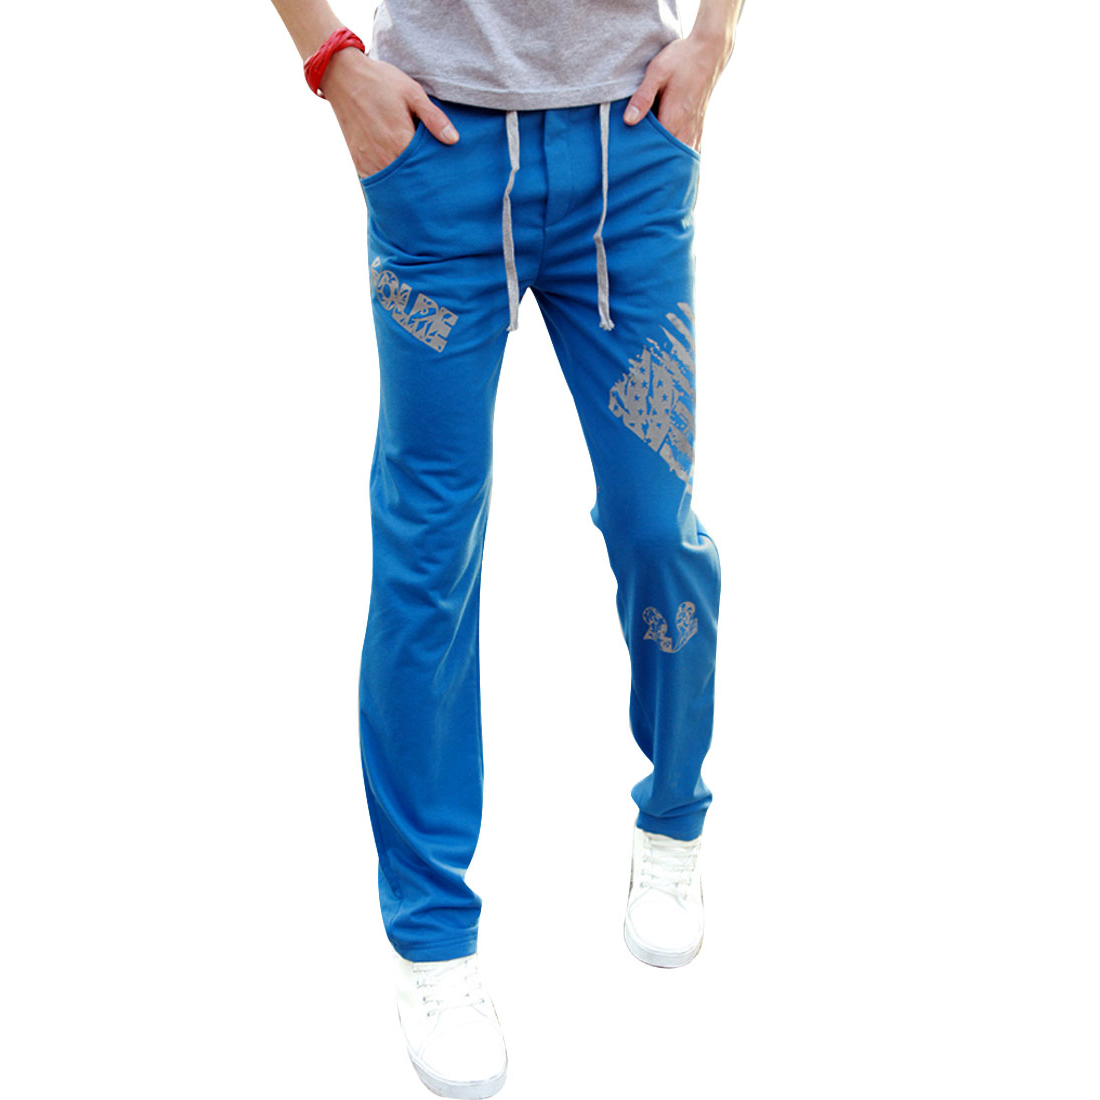 Men Drawstring Elastic Waist Novelty Prints Pants Royal Blue W28